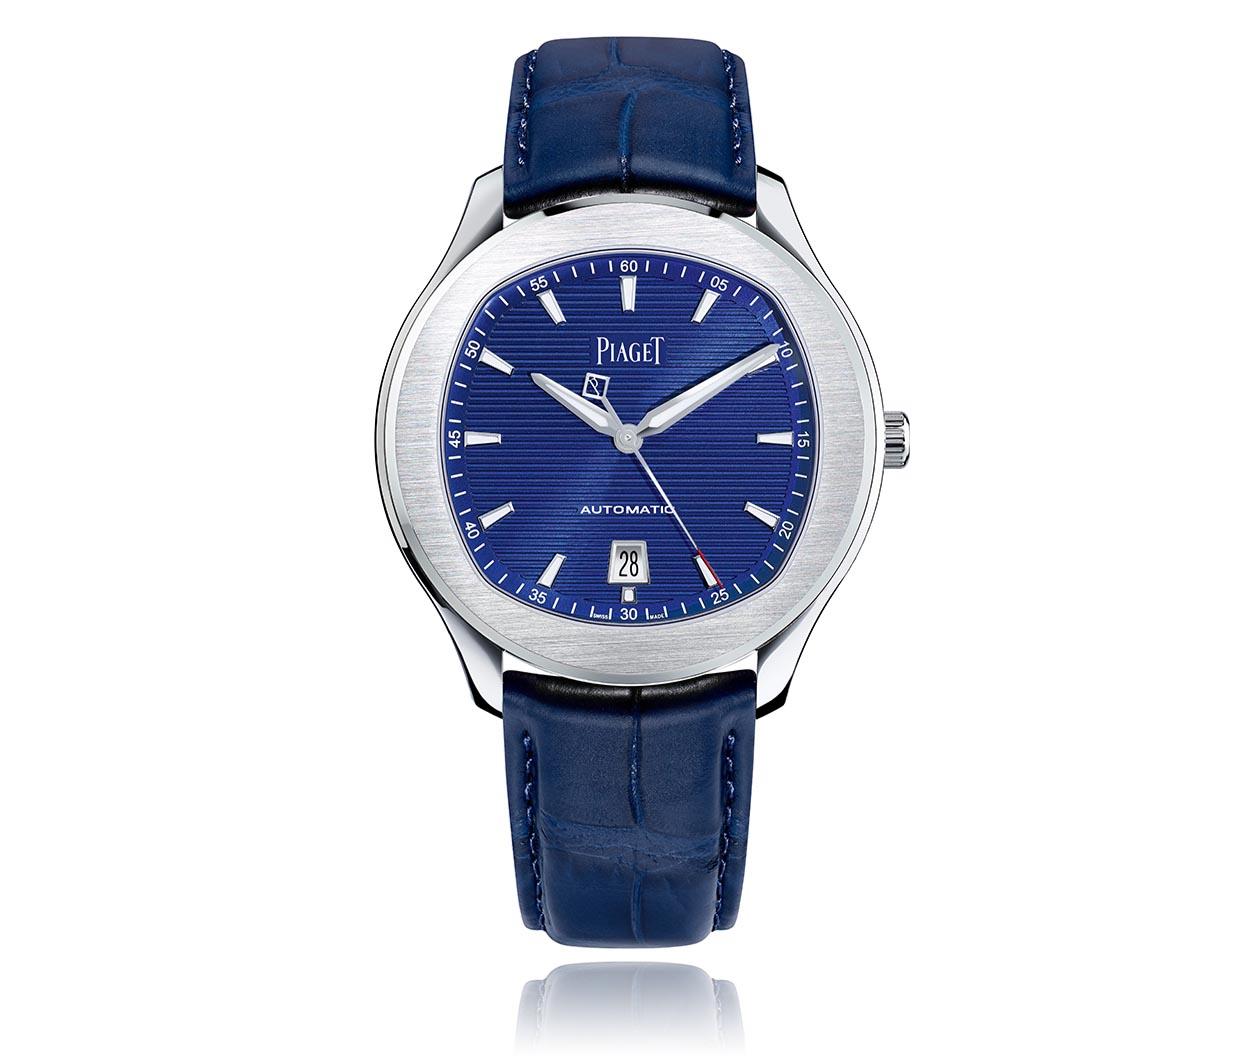 Piaget Polo watch G0A43001 Carousel 1 FINAL